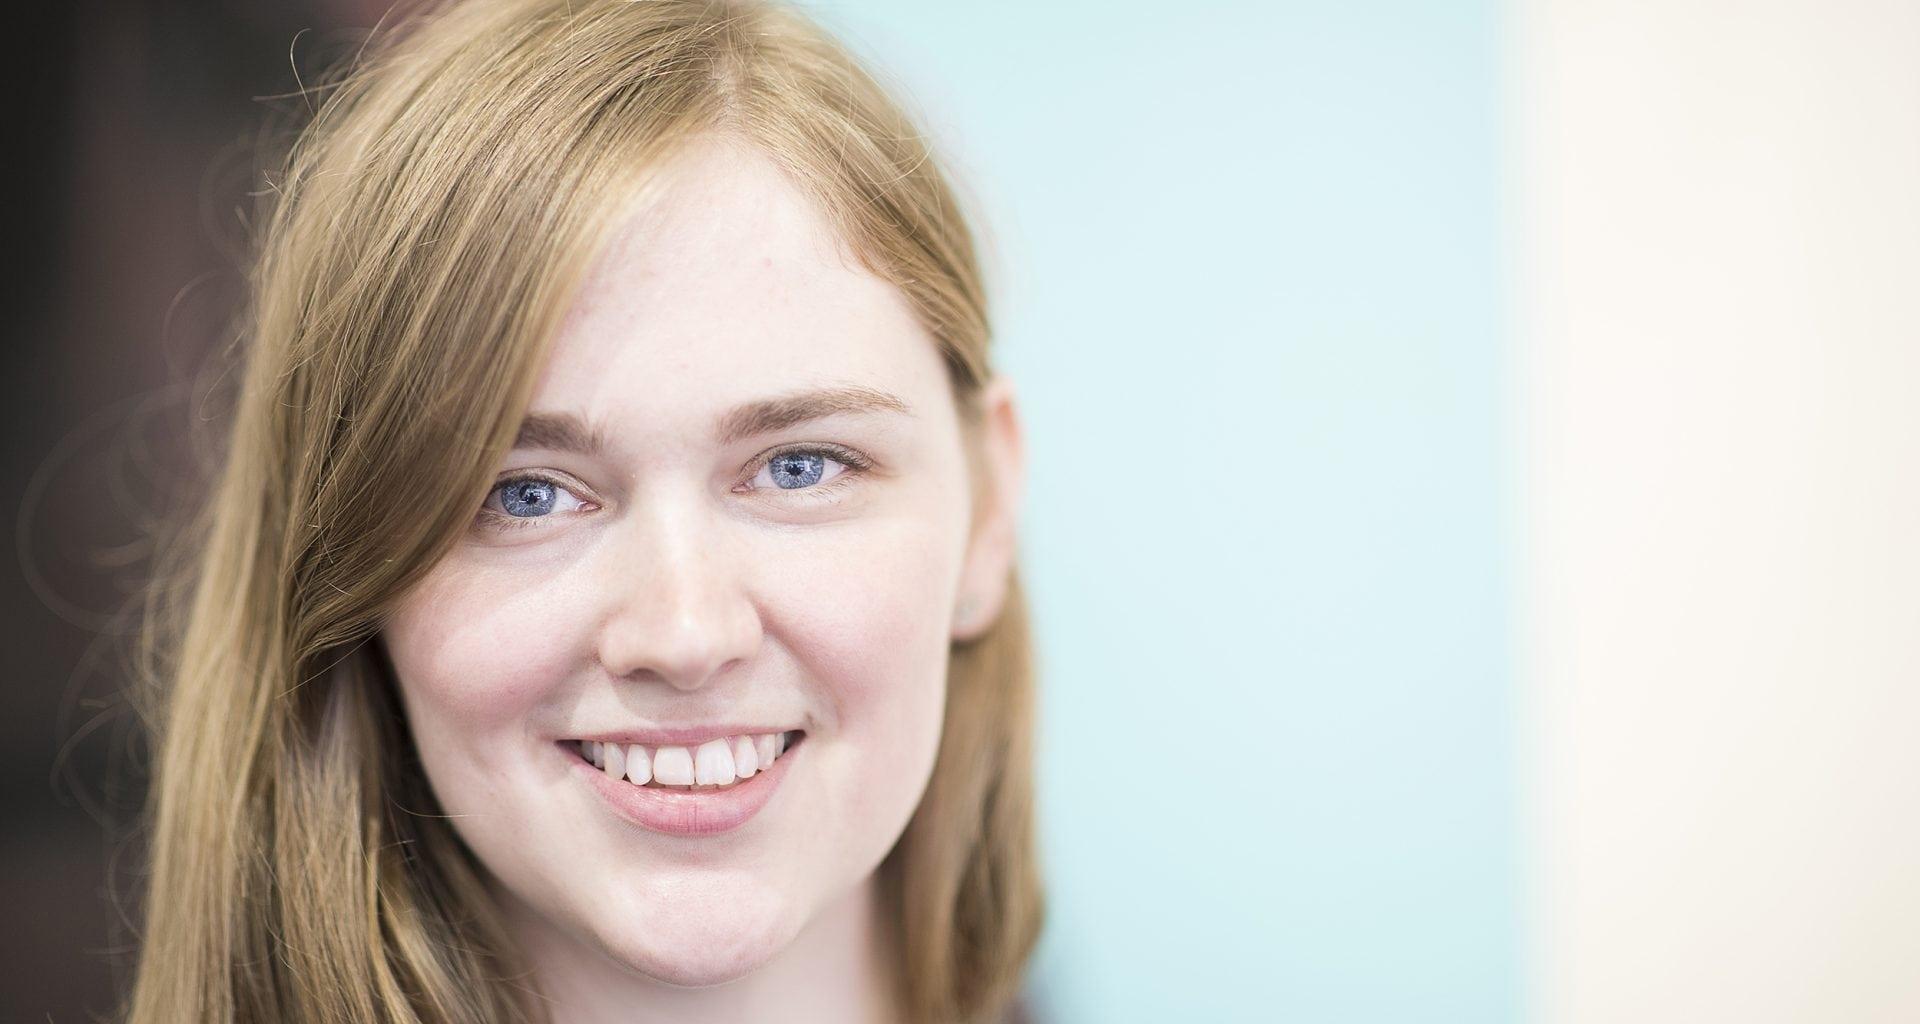 Visual Communication graduate Lucy Saunders